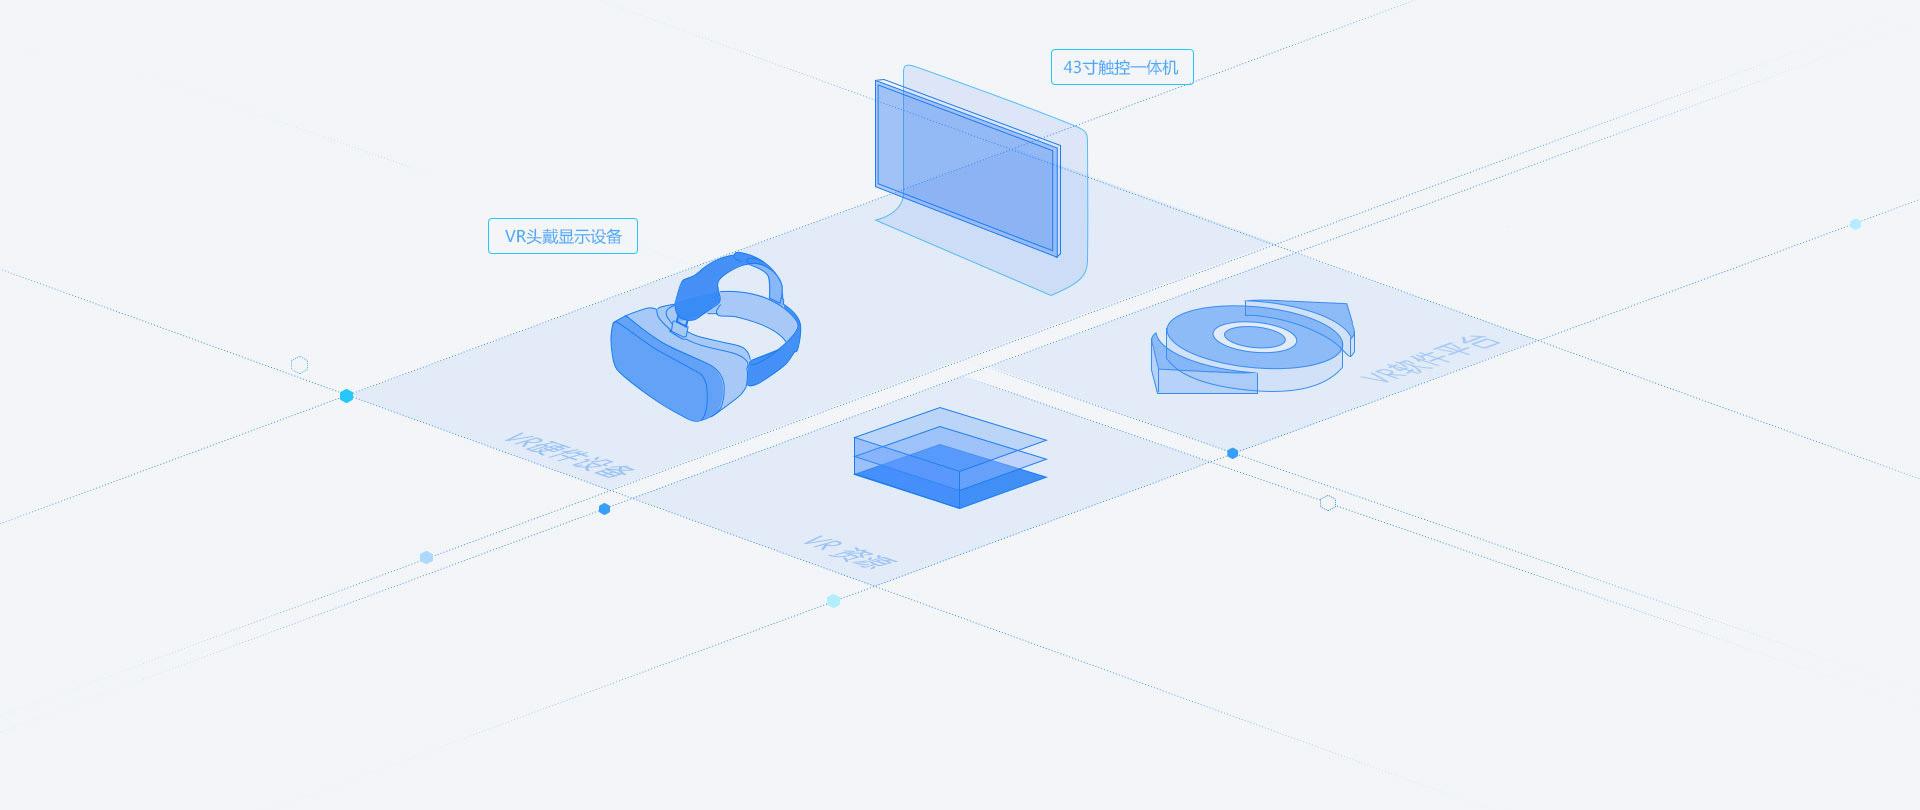 101 VR角方案组成